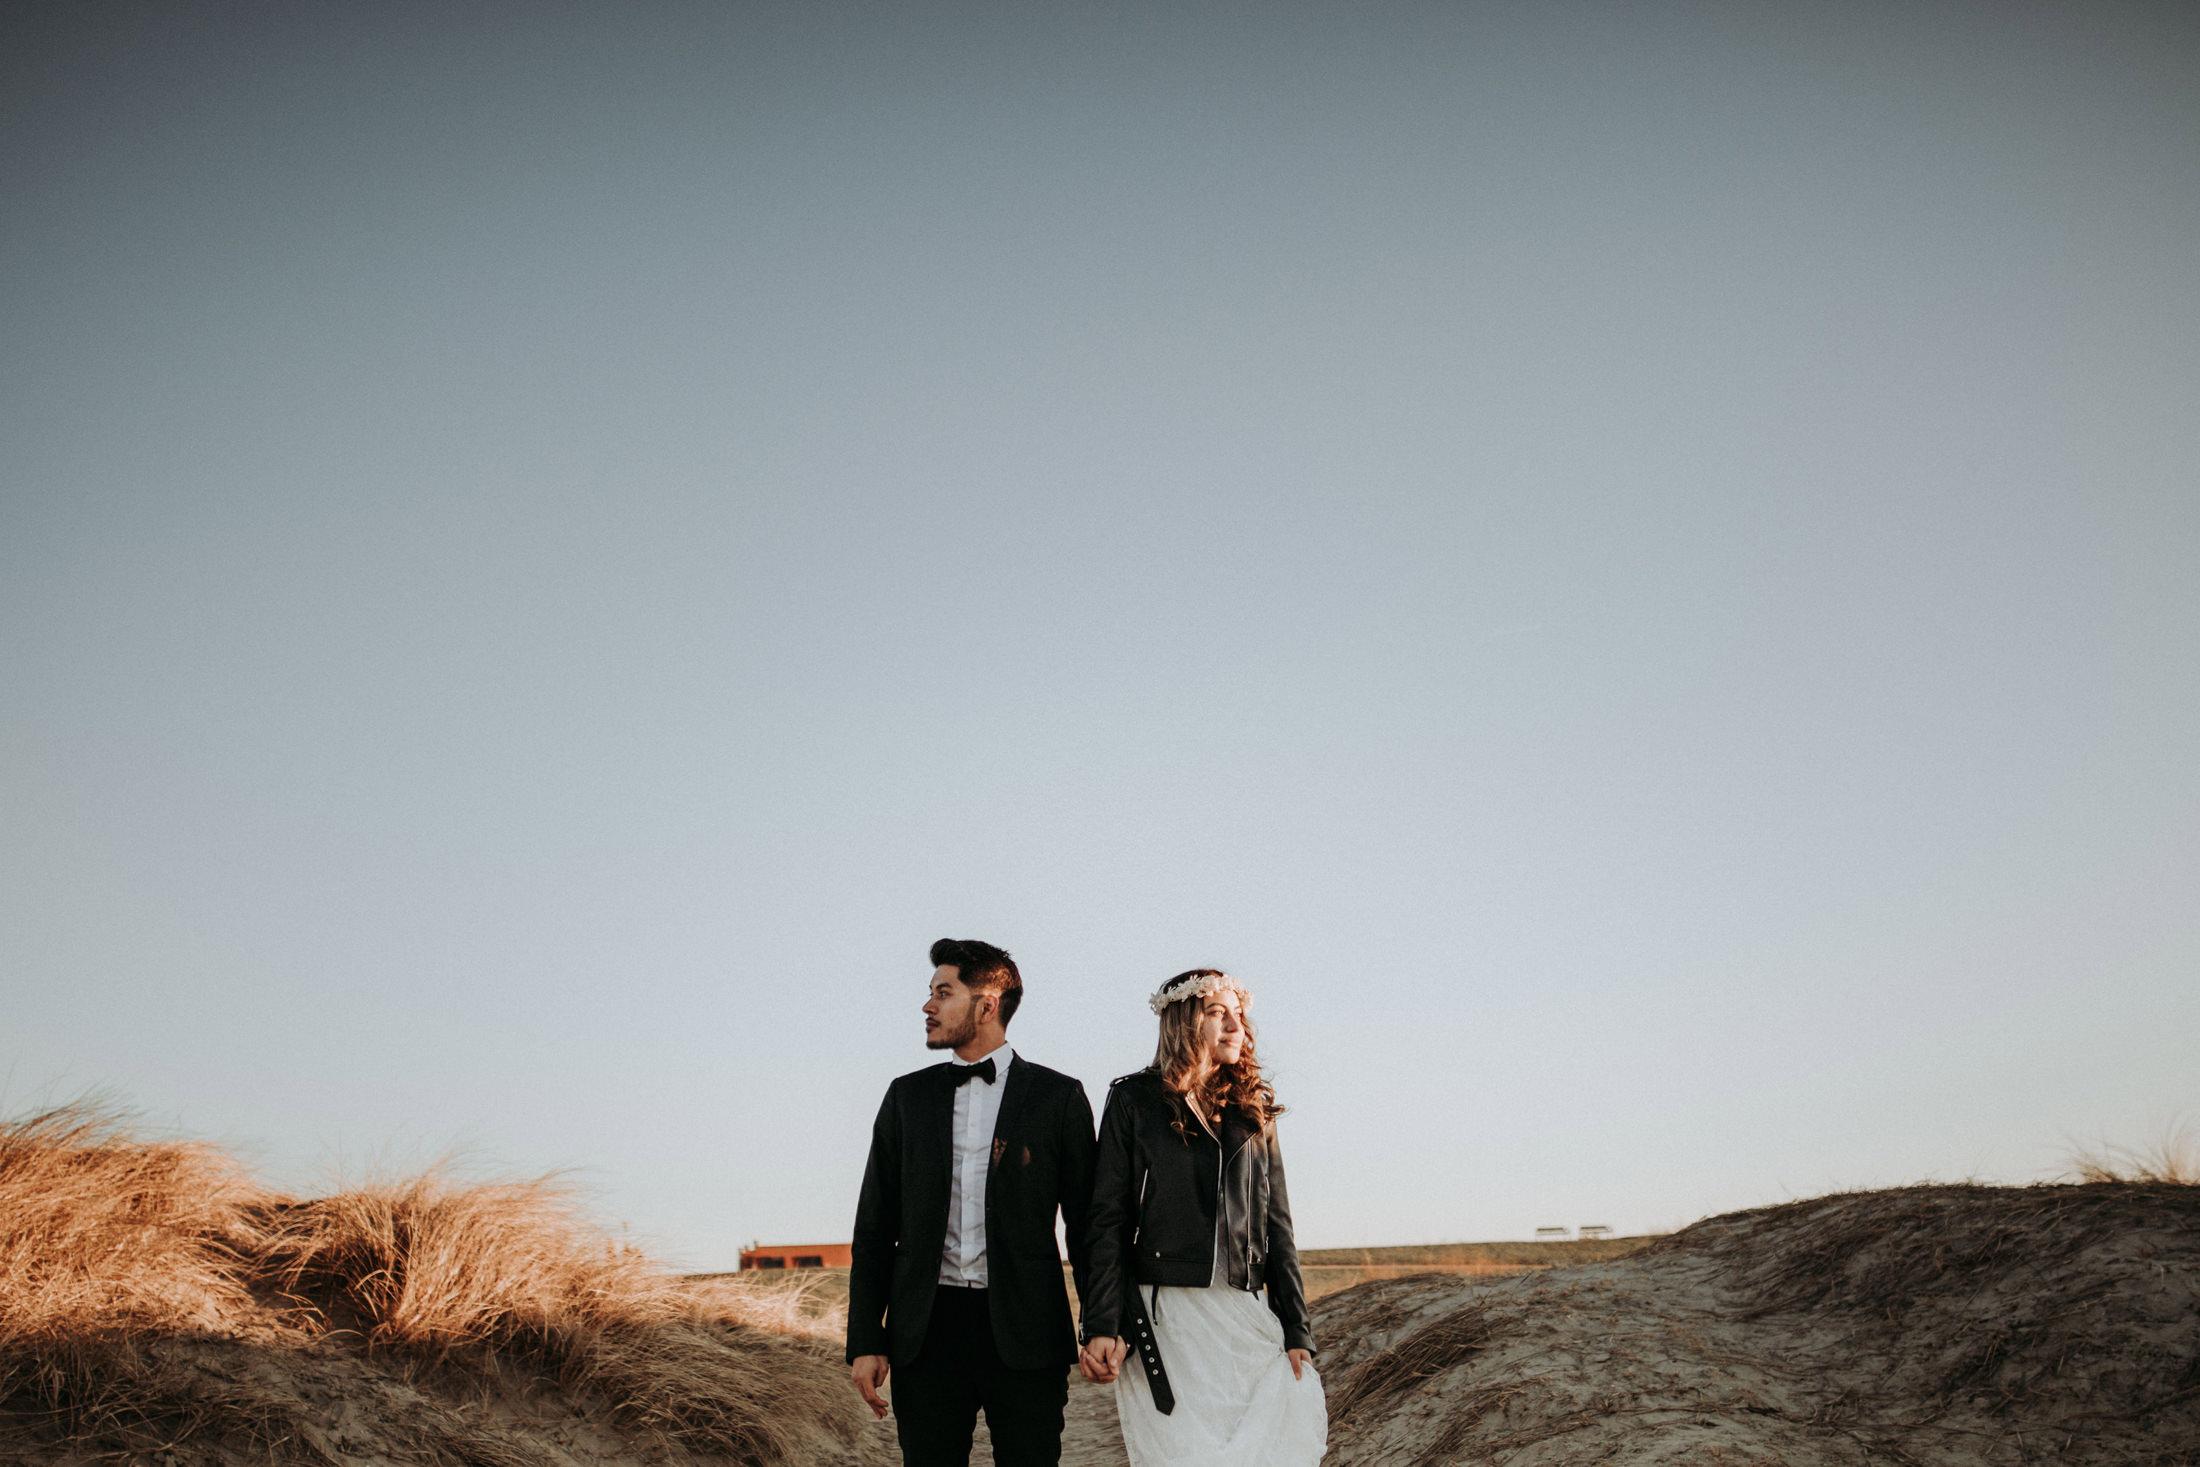 Wedding_Photographer_Mallorca_Daniela-Marquardt_Photography_CanaryIslands_Lanzarote_Iceland_Tuskany_Santorini_Portugal_Schweiz_Austria_Bayern_Elopement_Hochzeitsfotograf_Norddeichich_14